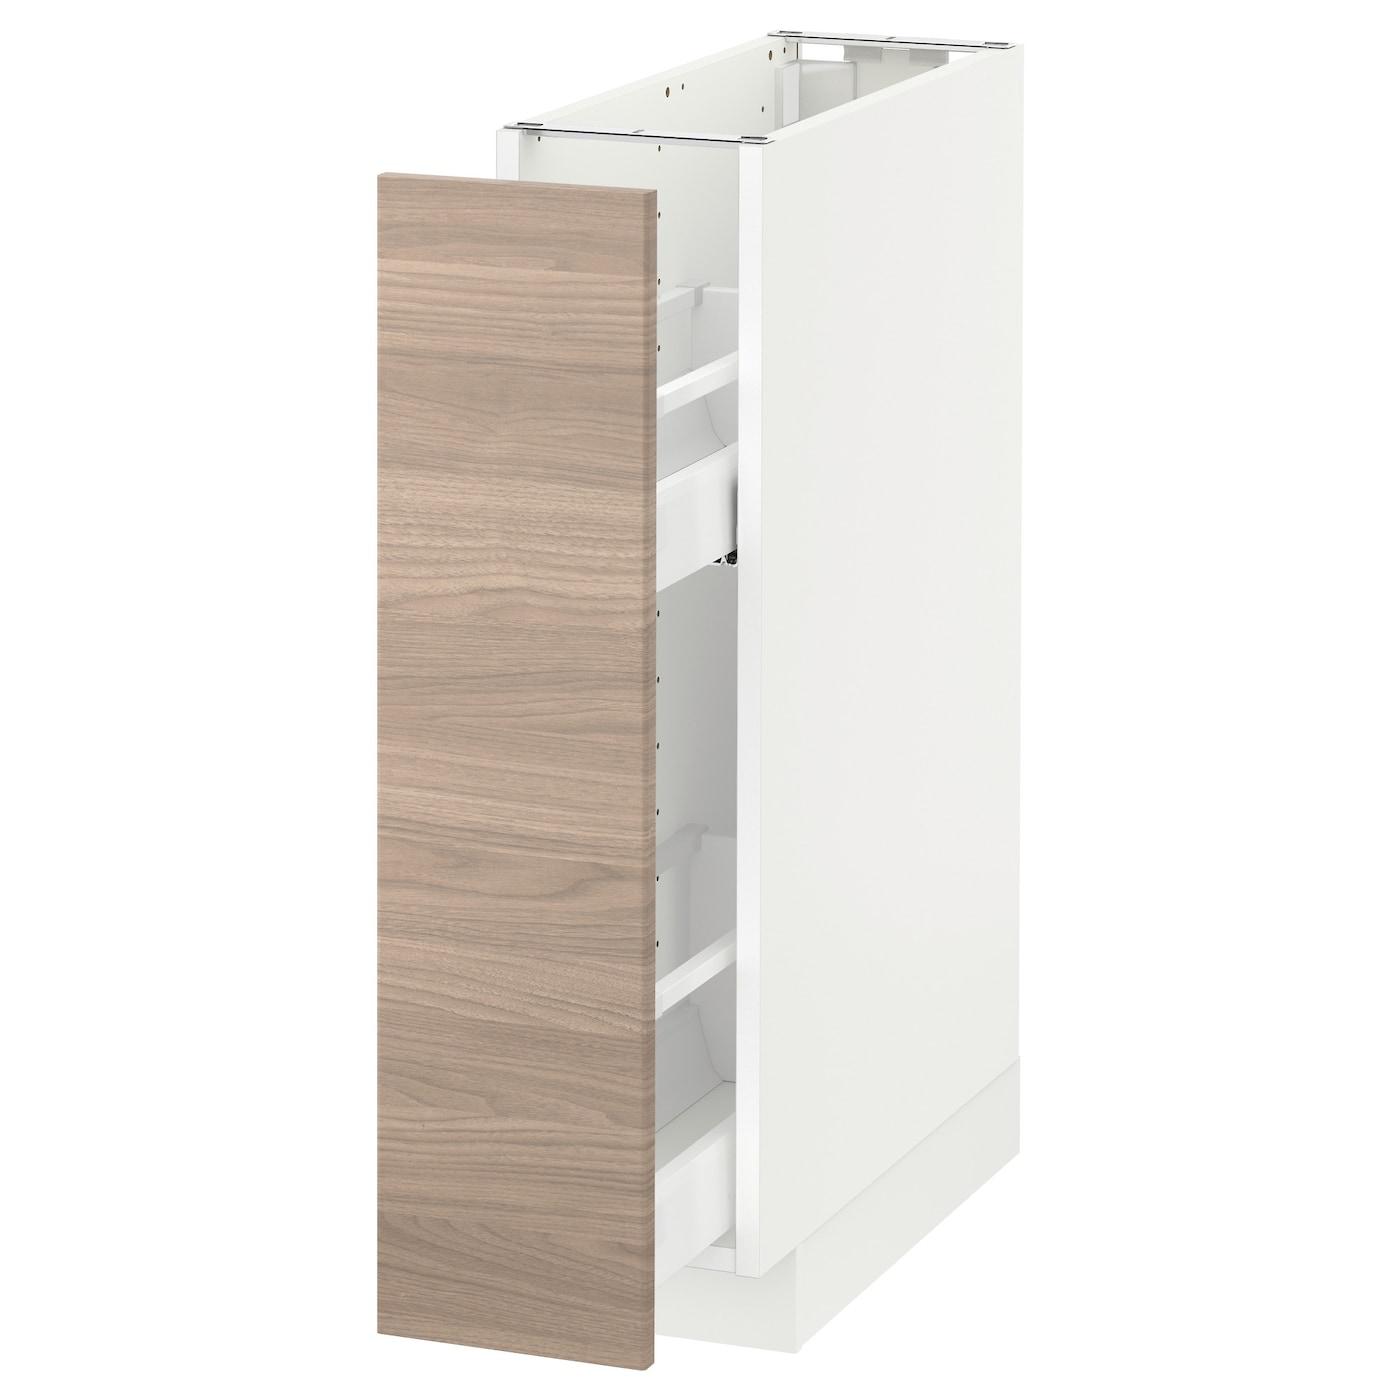 Metod Element Bas Rgts Coulissants Blanc Brokhult Gris Clair 20x60 Cm Ikea